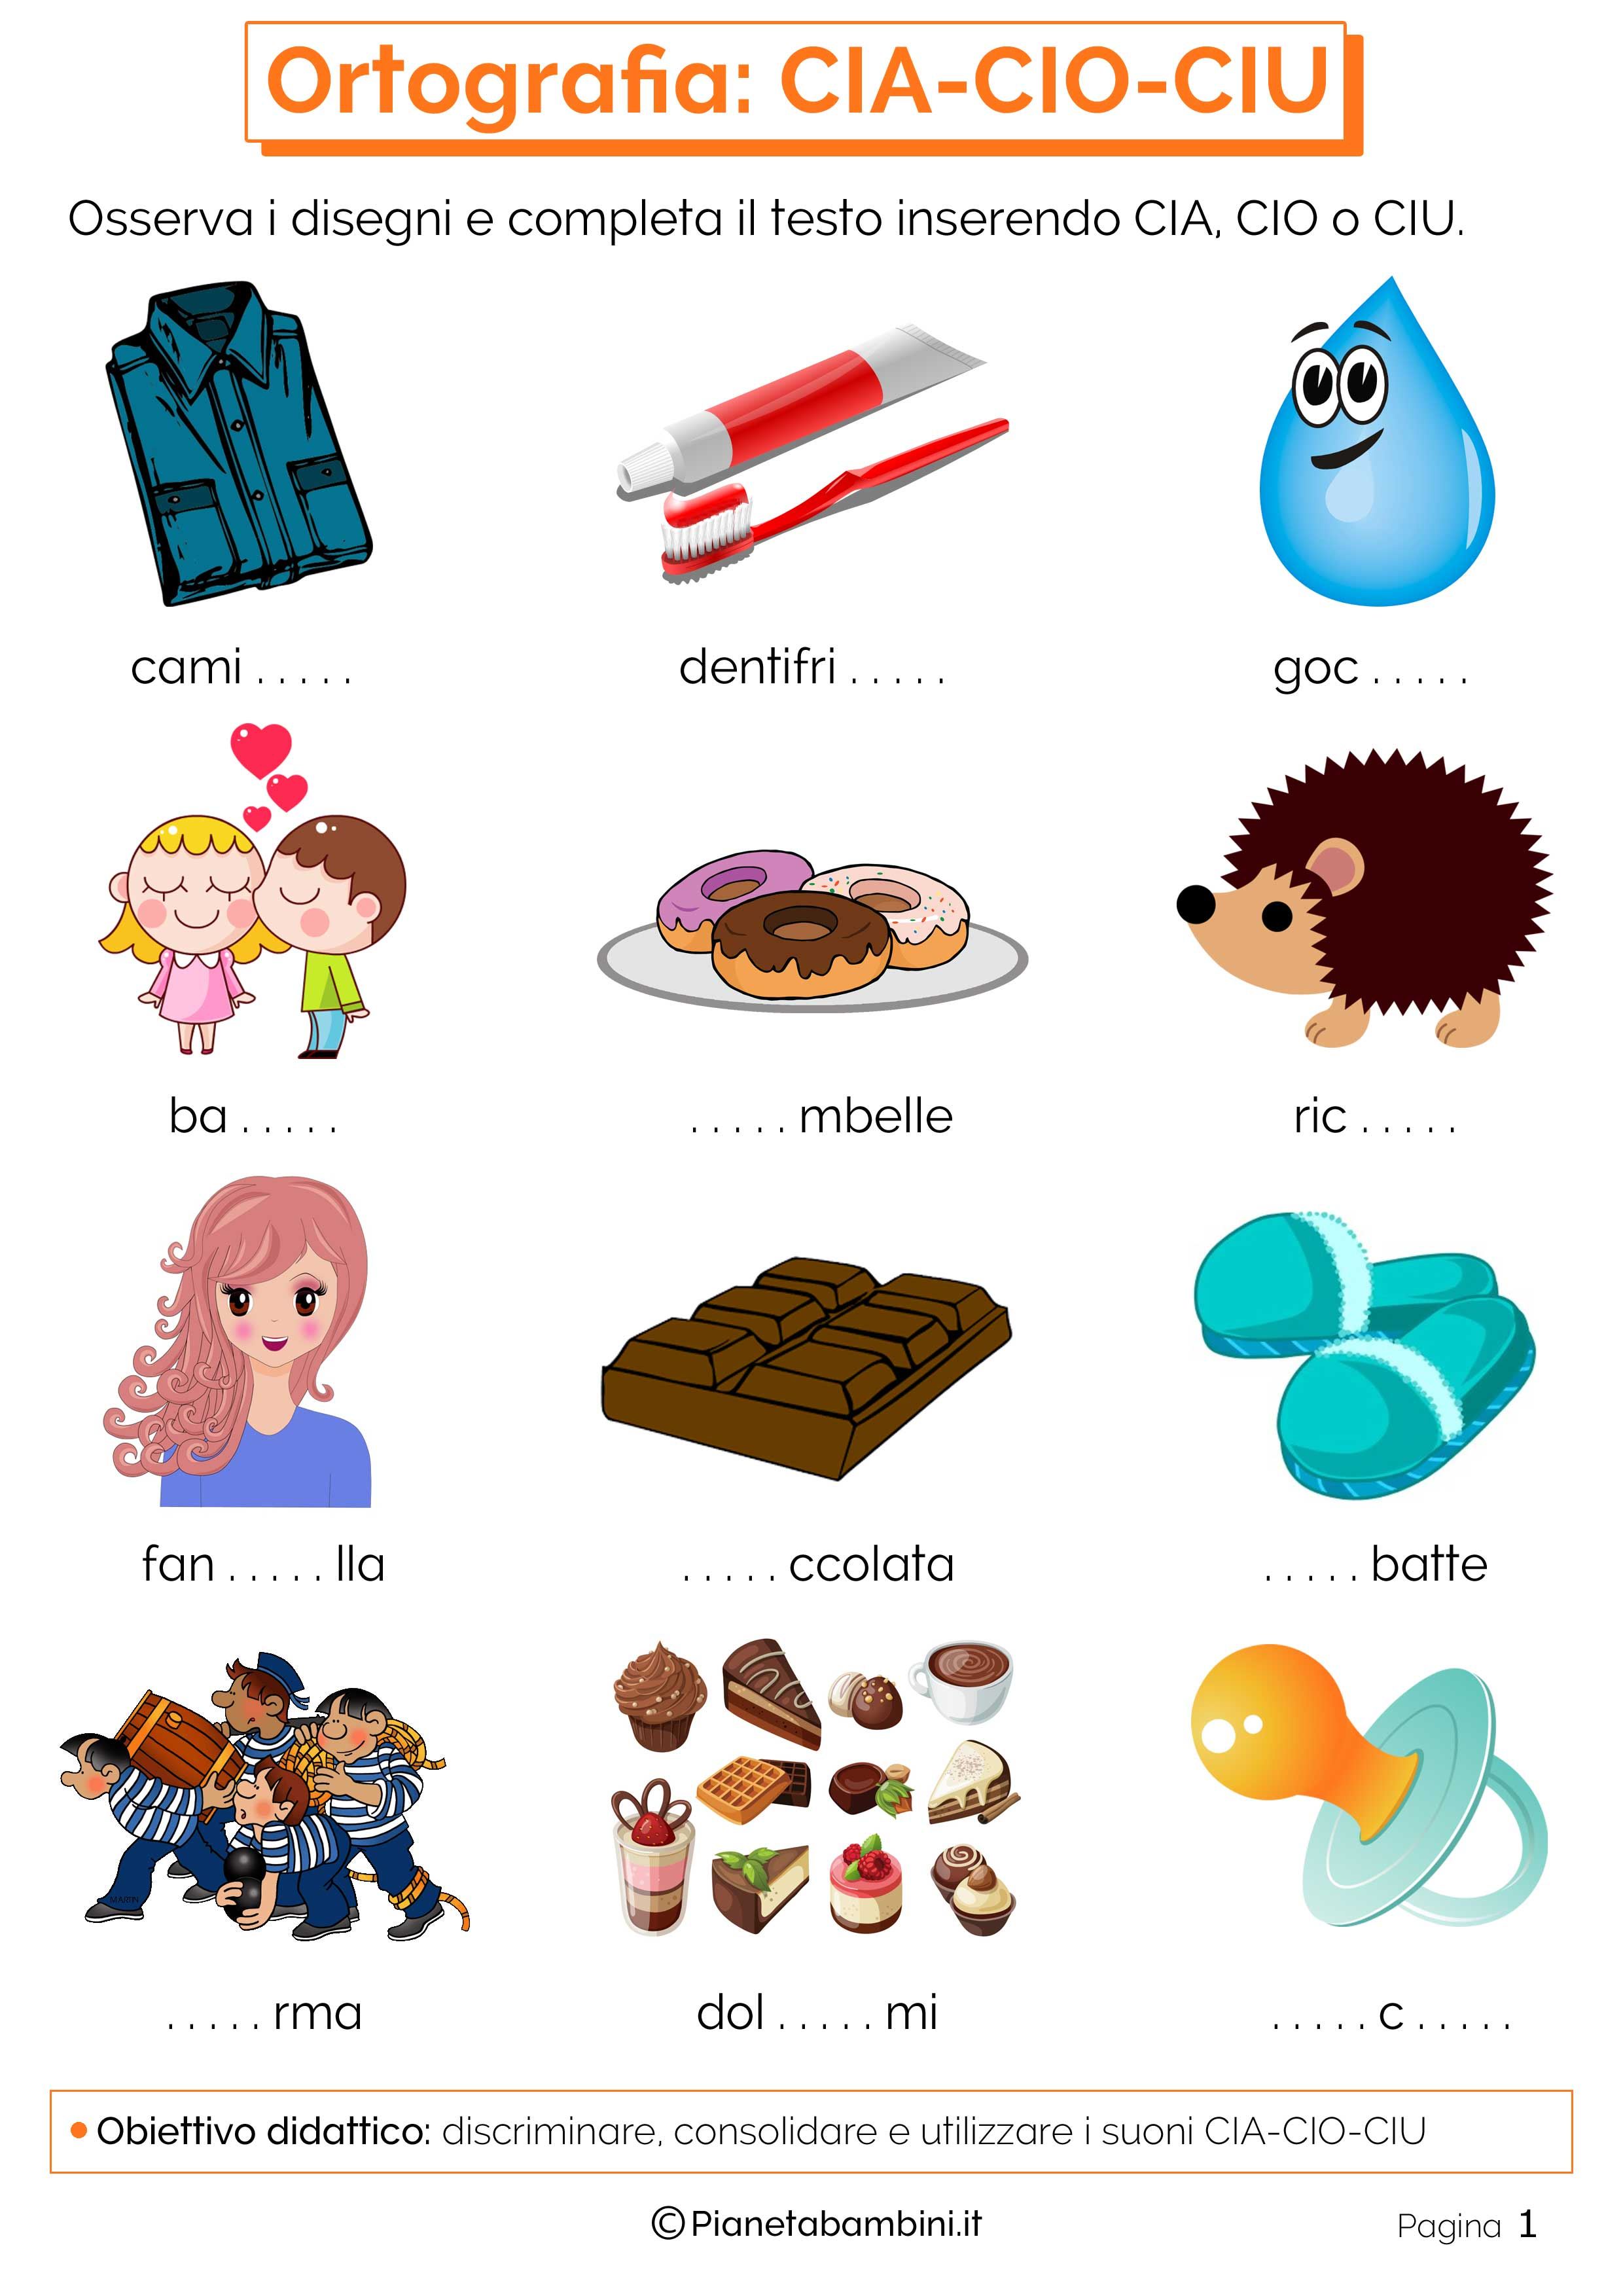 Inspirational disegni da colorare gia gio giu for Parole con gia gio giu